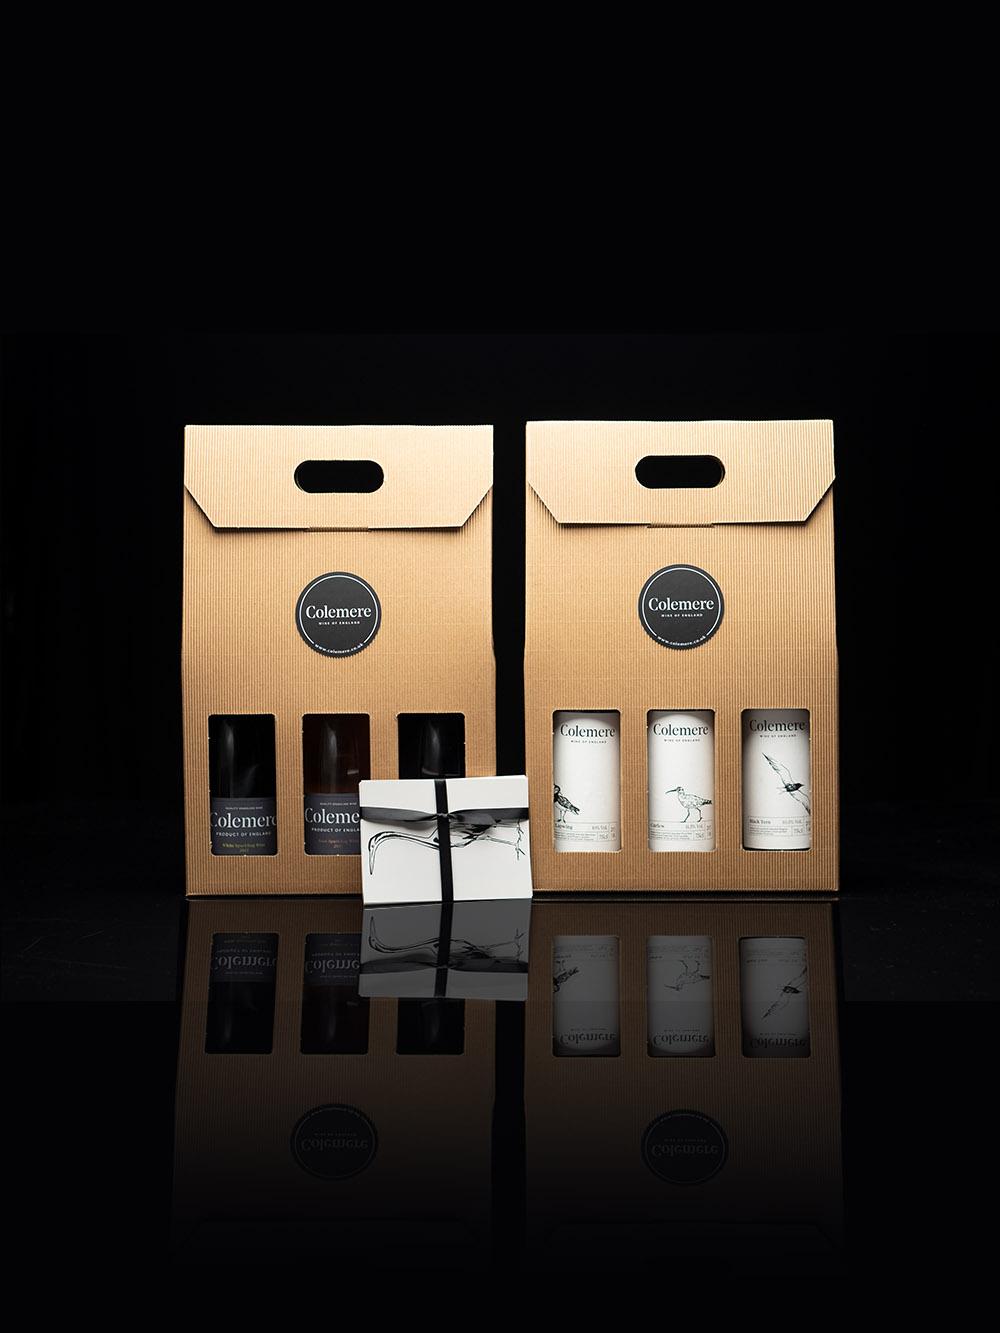 Triple Wine Bottle Gift Box english wine colemere shropshire